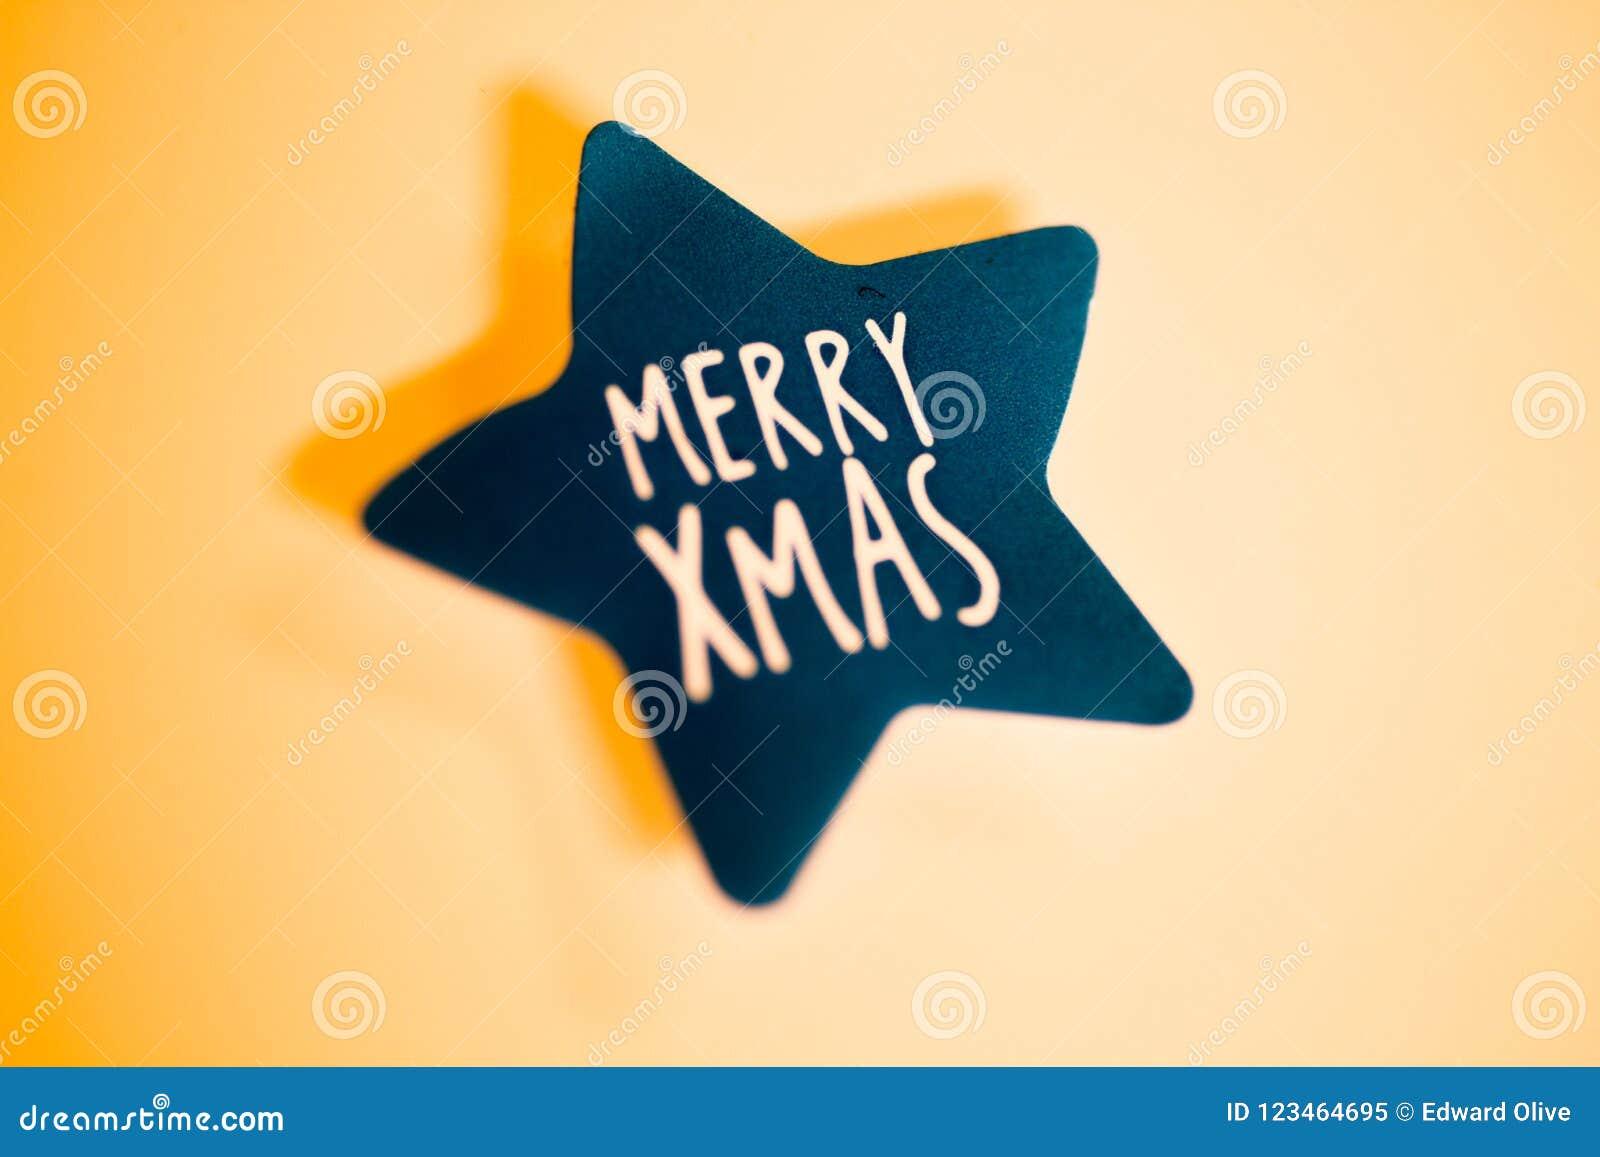 Merry Christmas Greetings Message Stock Illustration Illustration